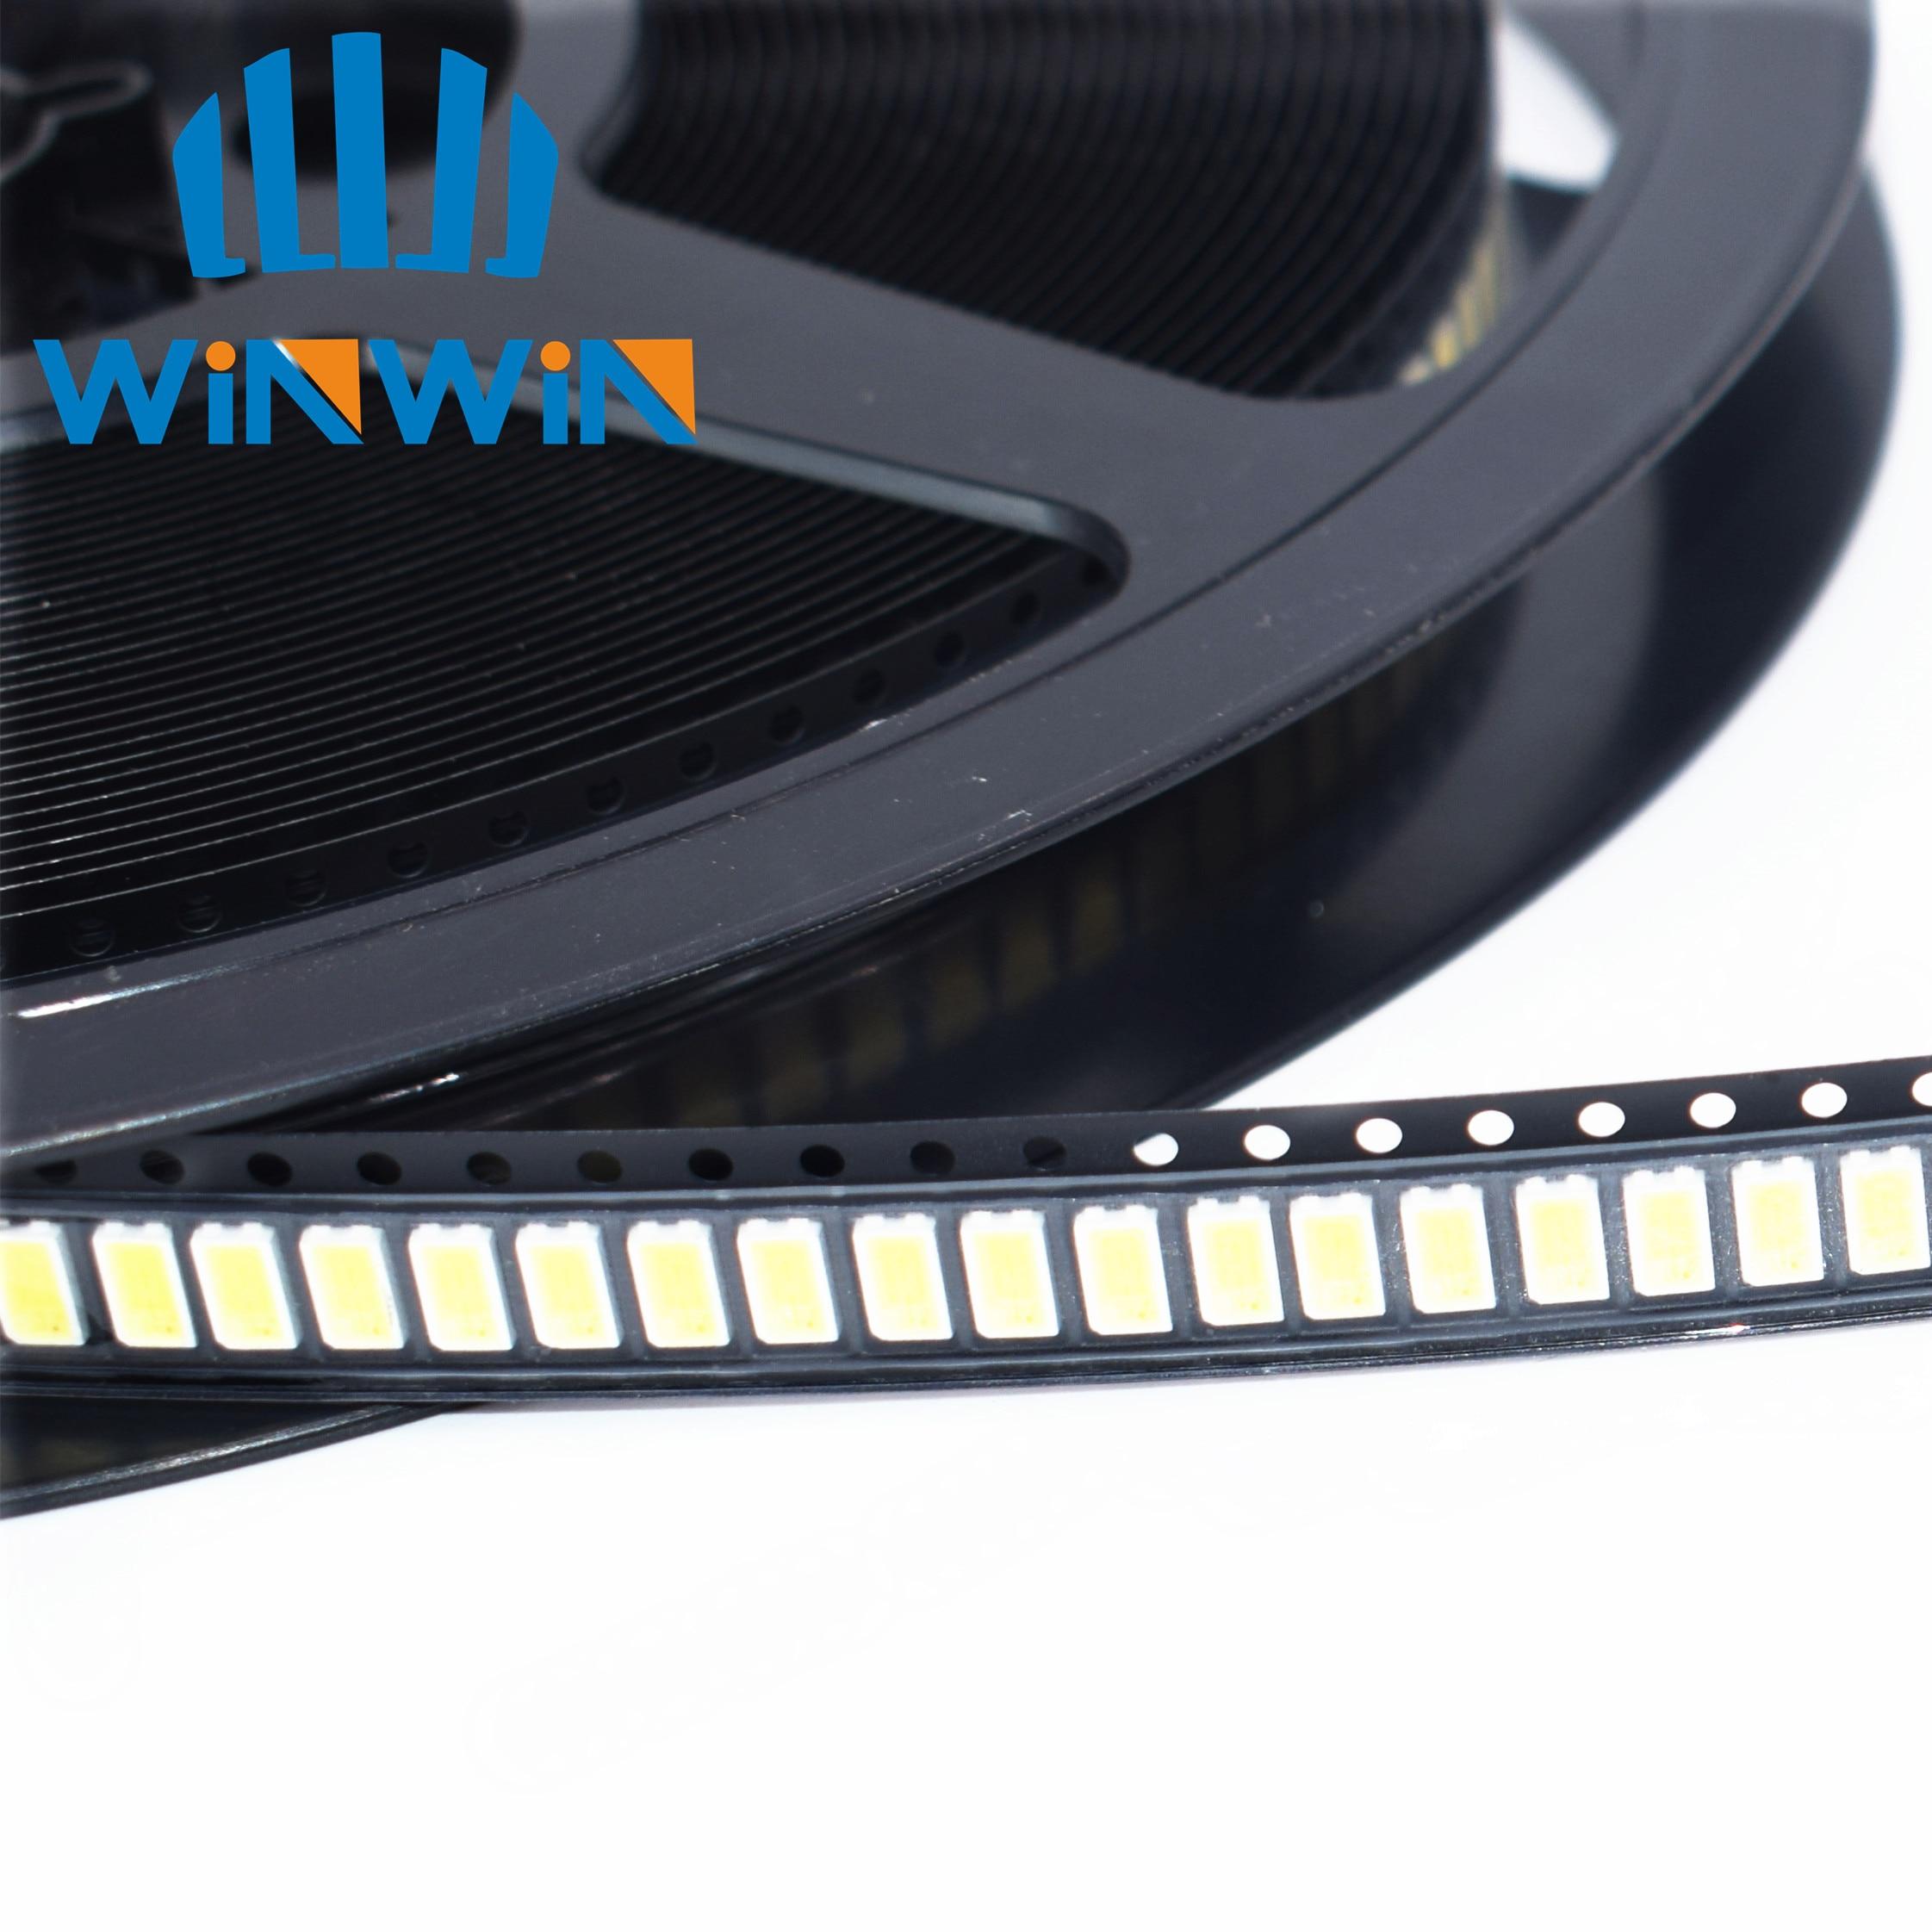 1000PCS For SAMSUNG LED Backlight 0.5W 3v 5630 Cool white LCD Backlight for TV TV Application SPBWH1532S1ZVC1BIB